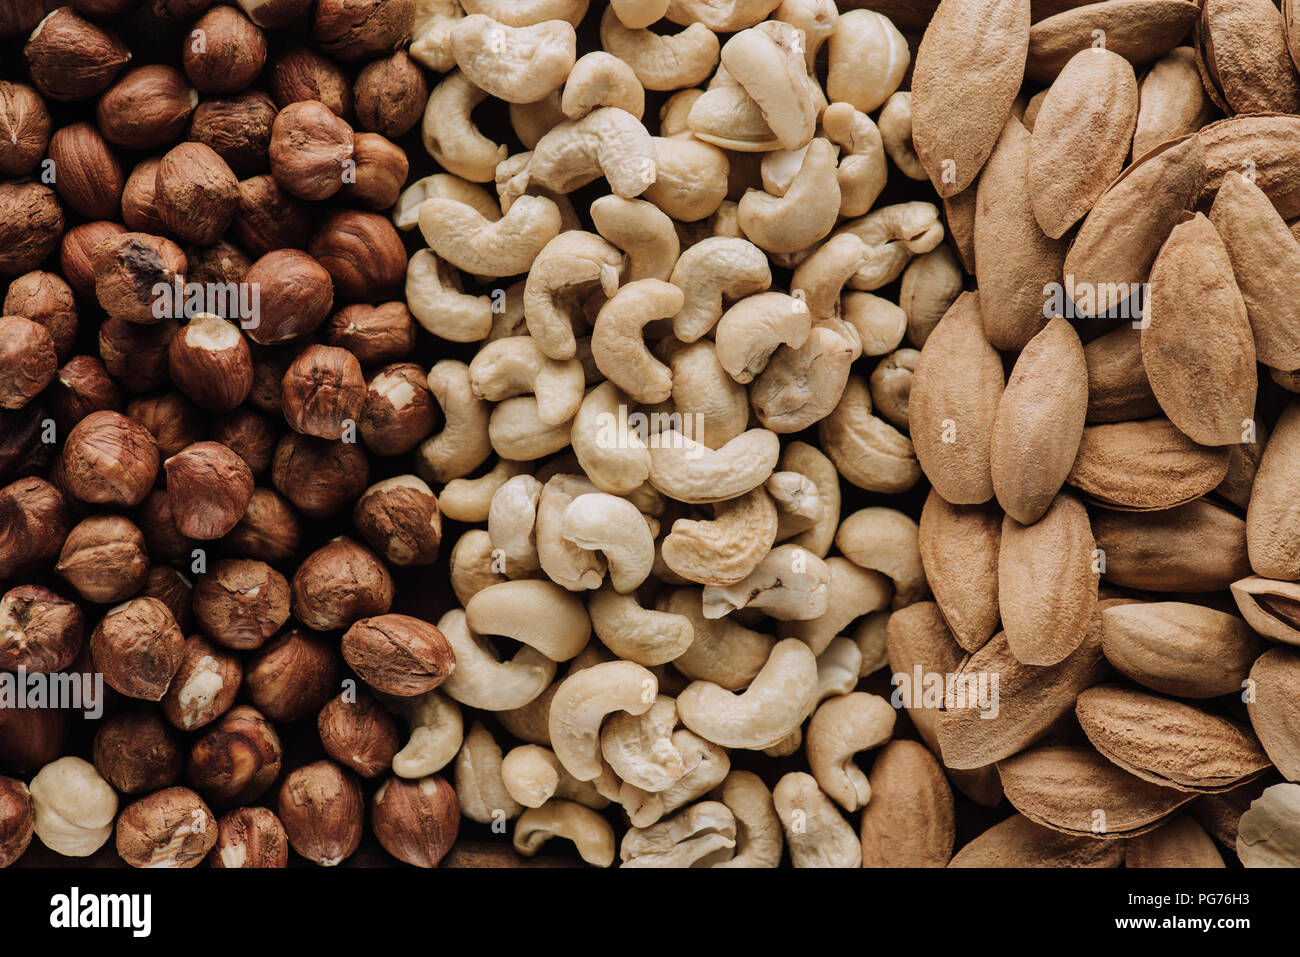 Verschiedene leckere Nüsse im Vollbildmodus Stockbild